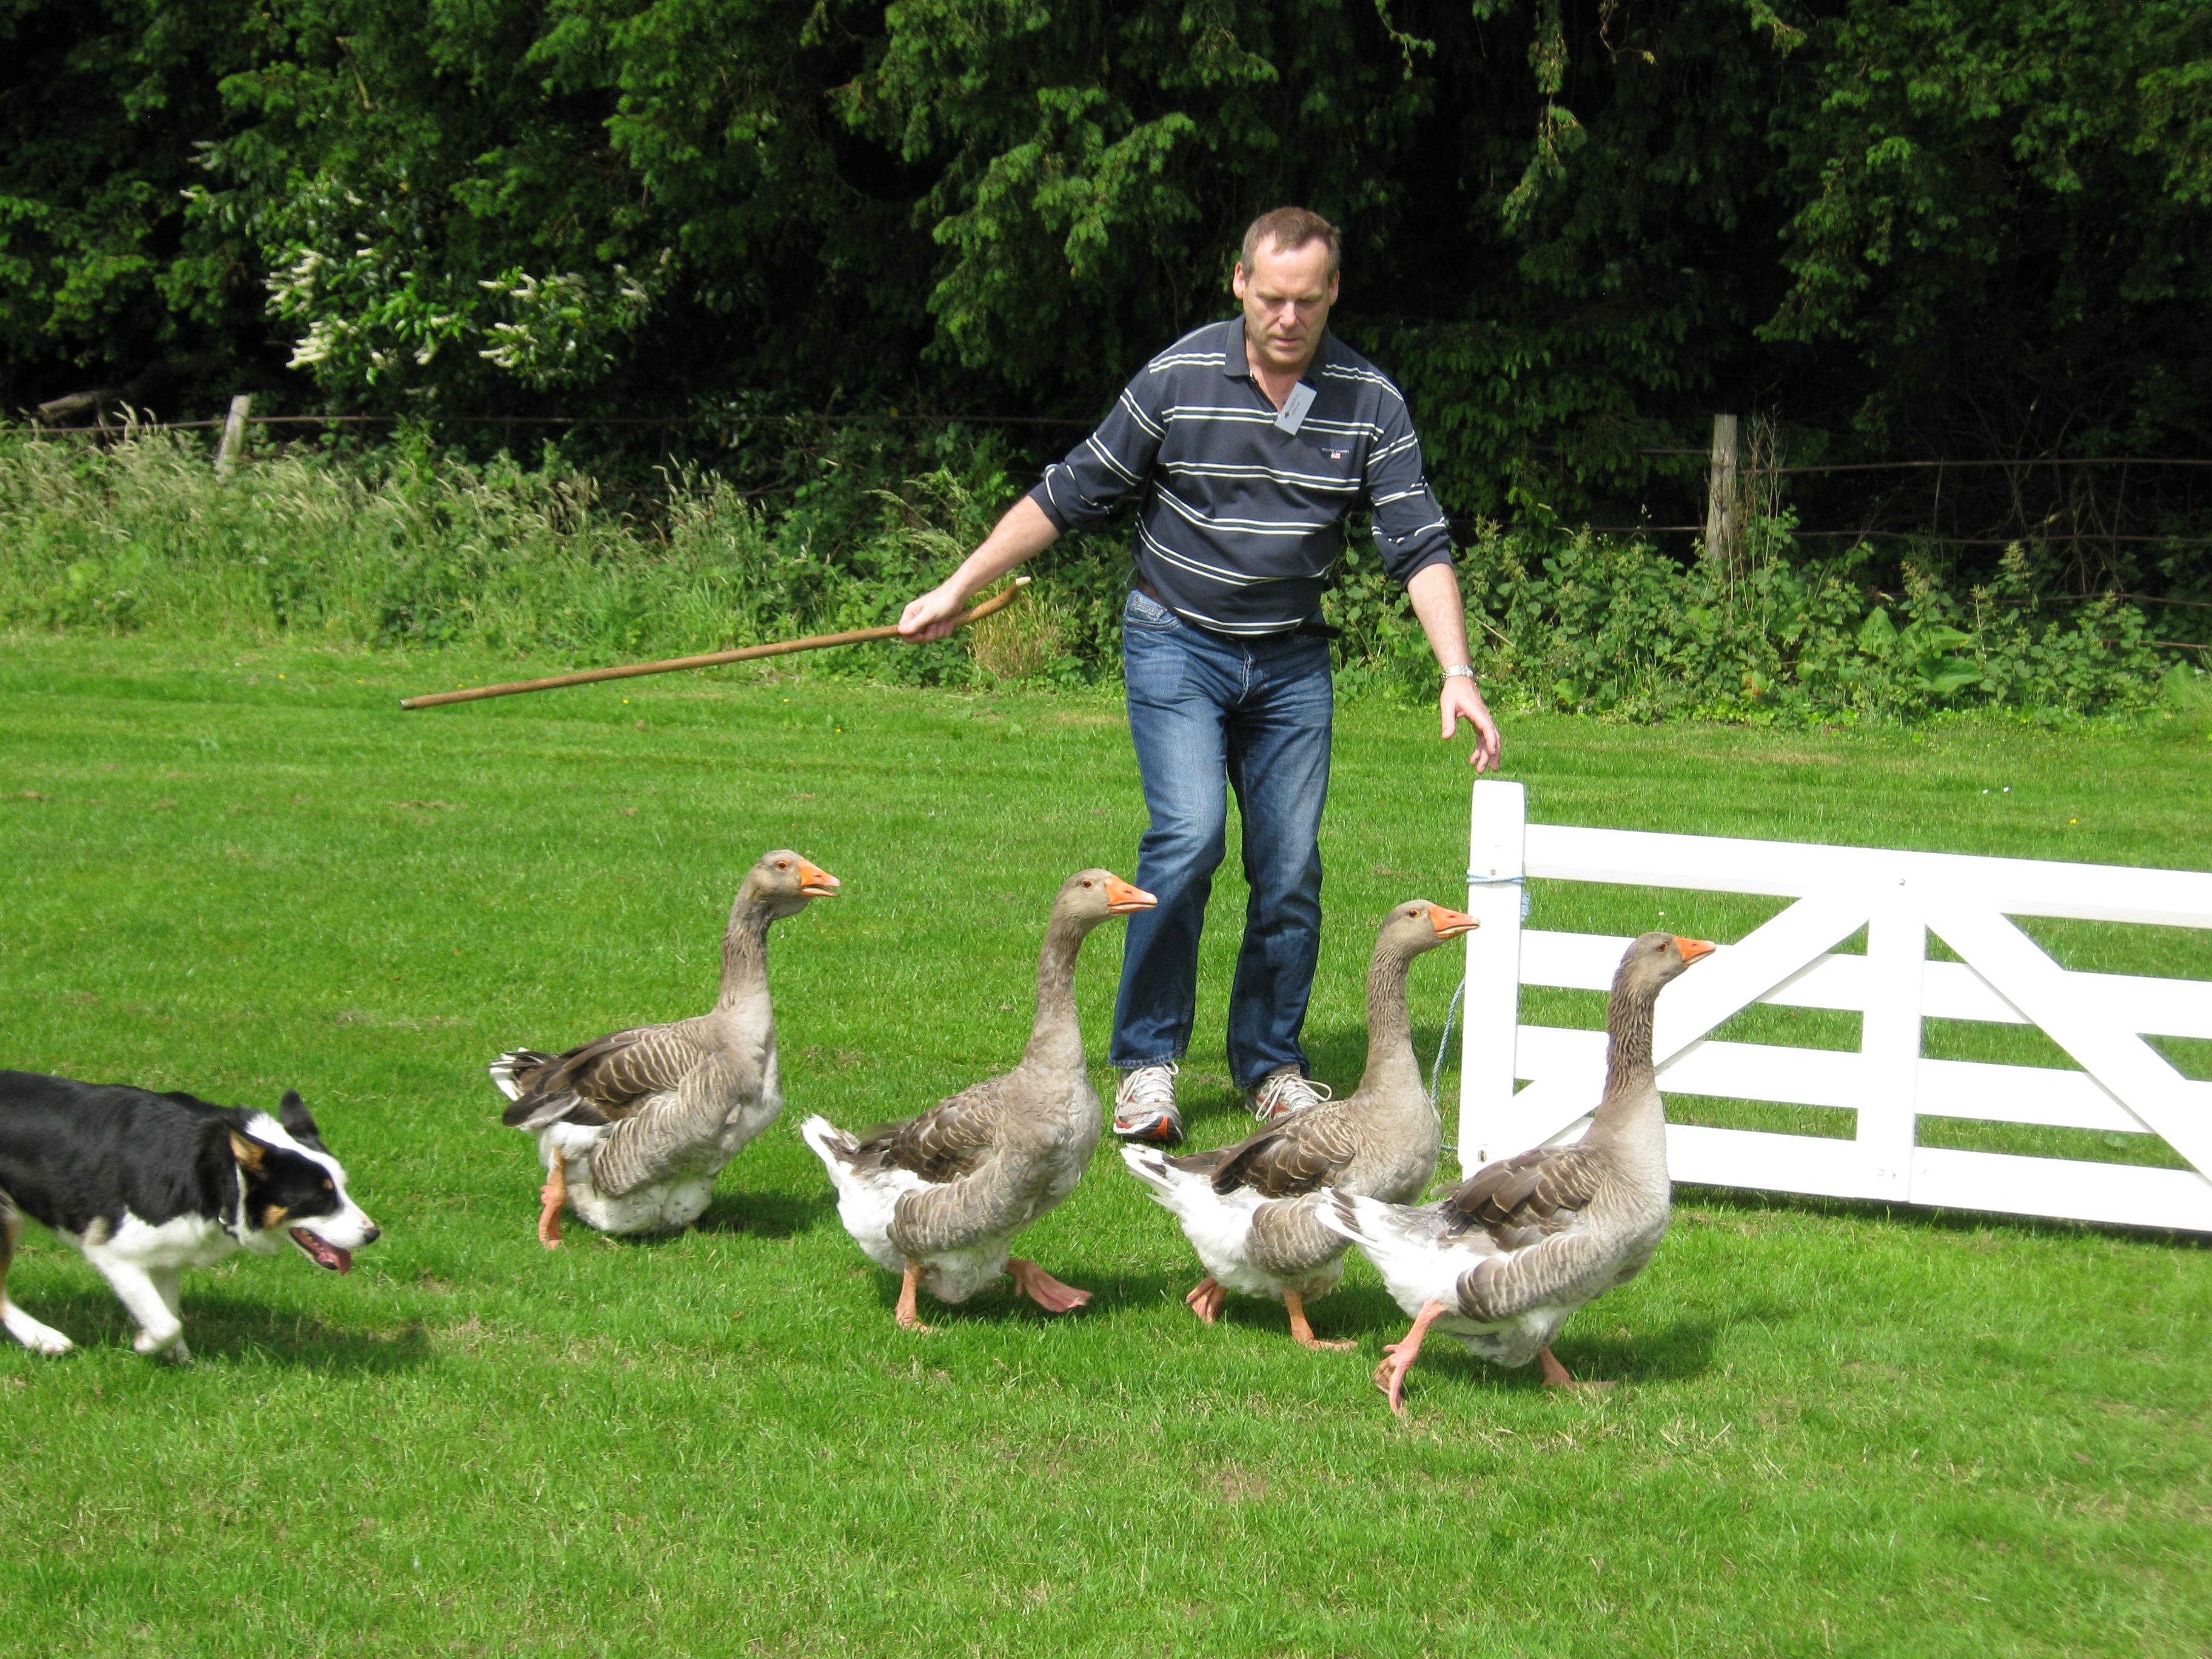 Sheepdog and Duck Herding